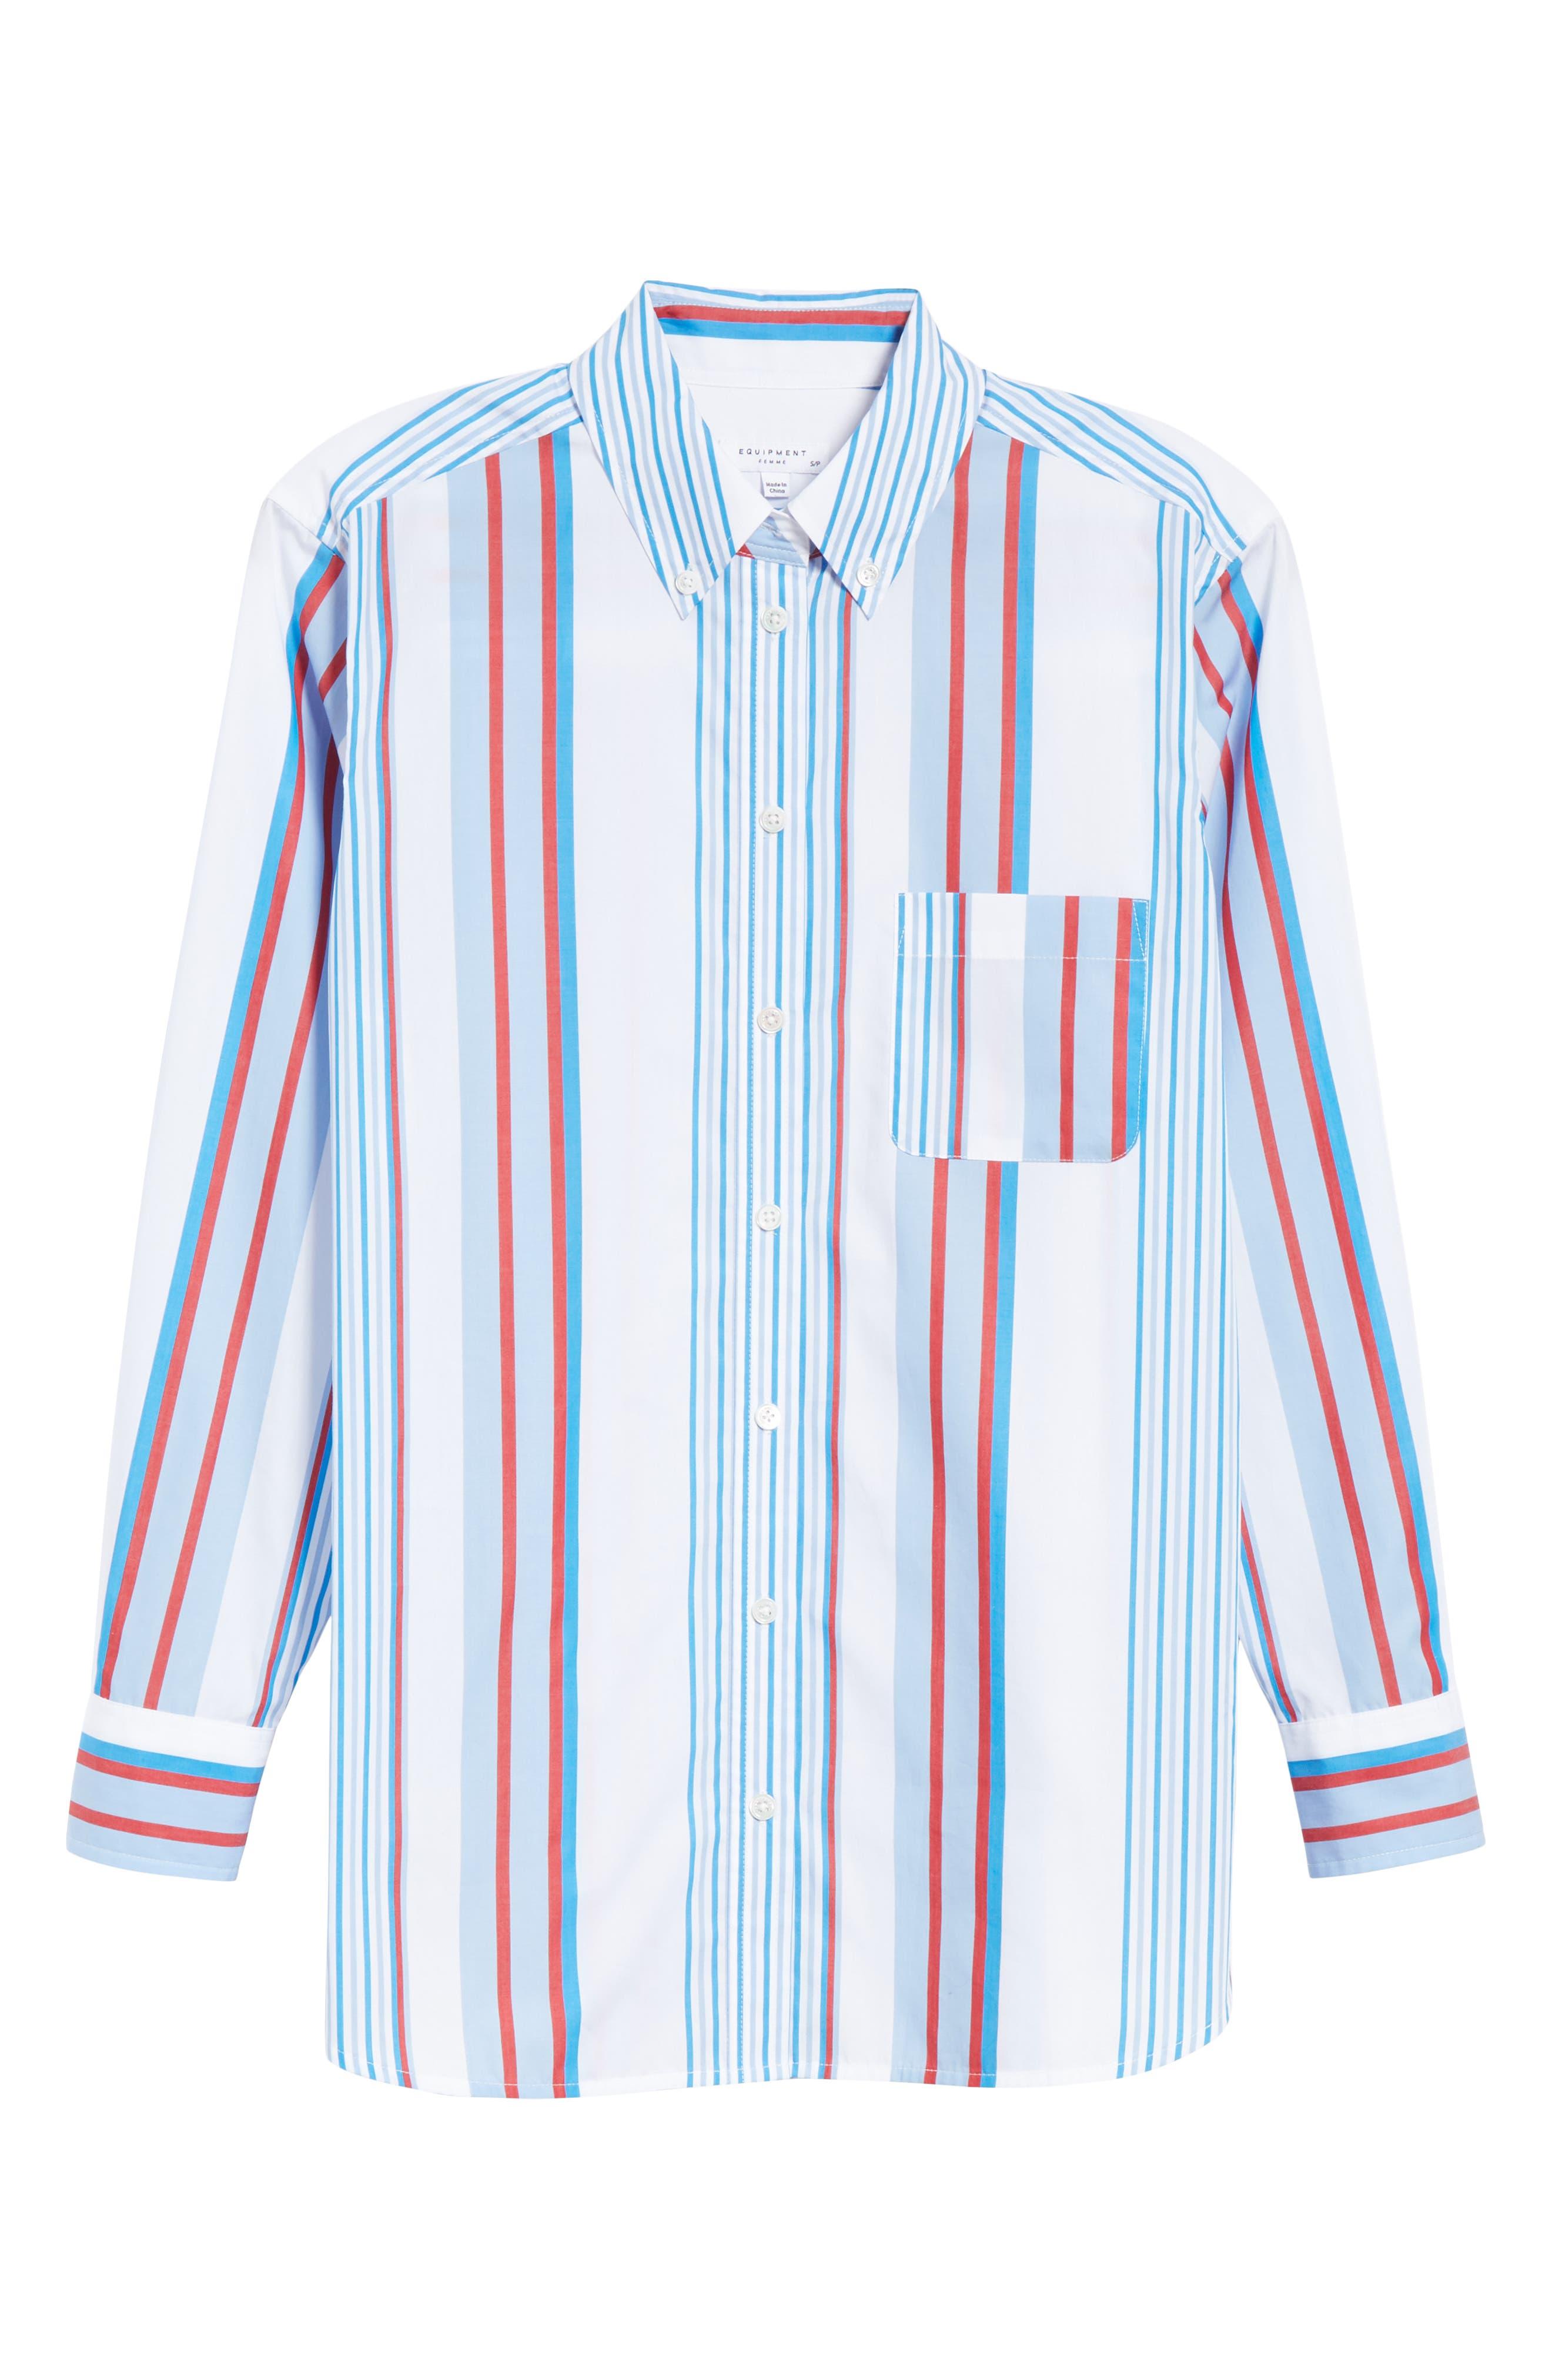 Margaux Stripe Shirt,                             Alternate thumbnail 6, color,                             BLUE WHITE MULTI